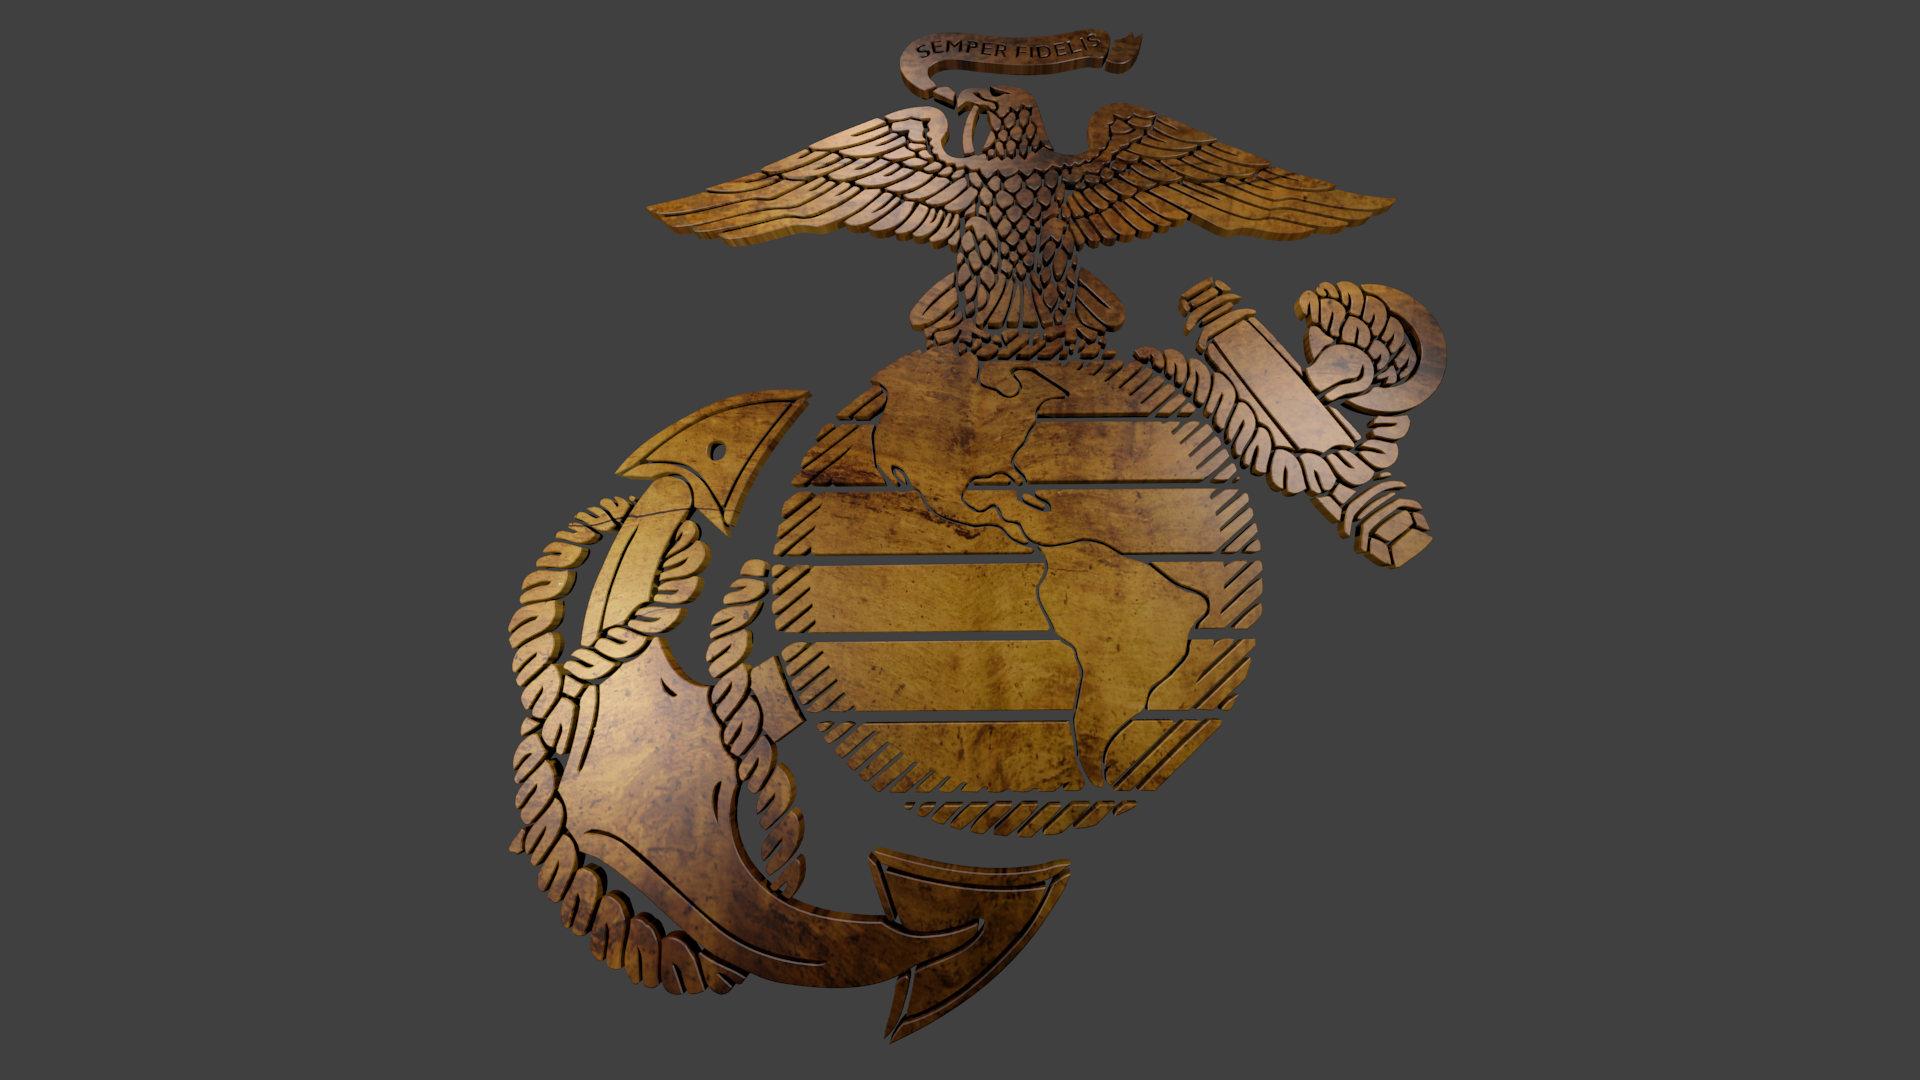 Marines USMC military r wallpaper 1920x1080 46655 WallpaperUP 1920x1080